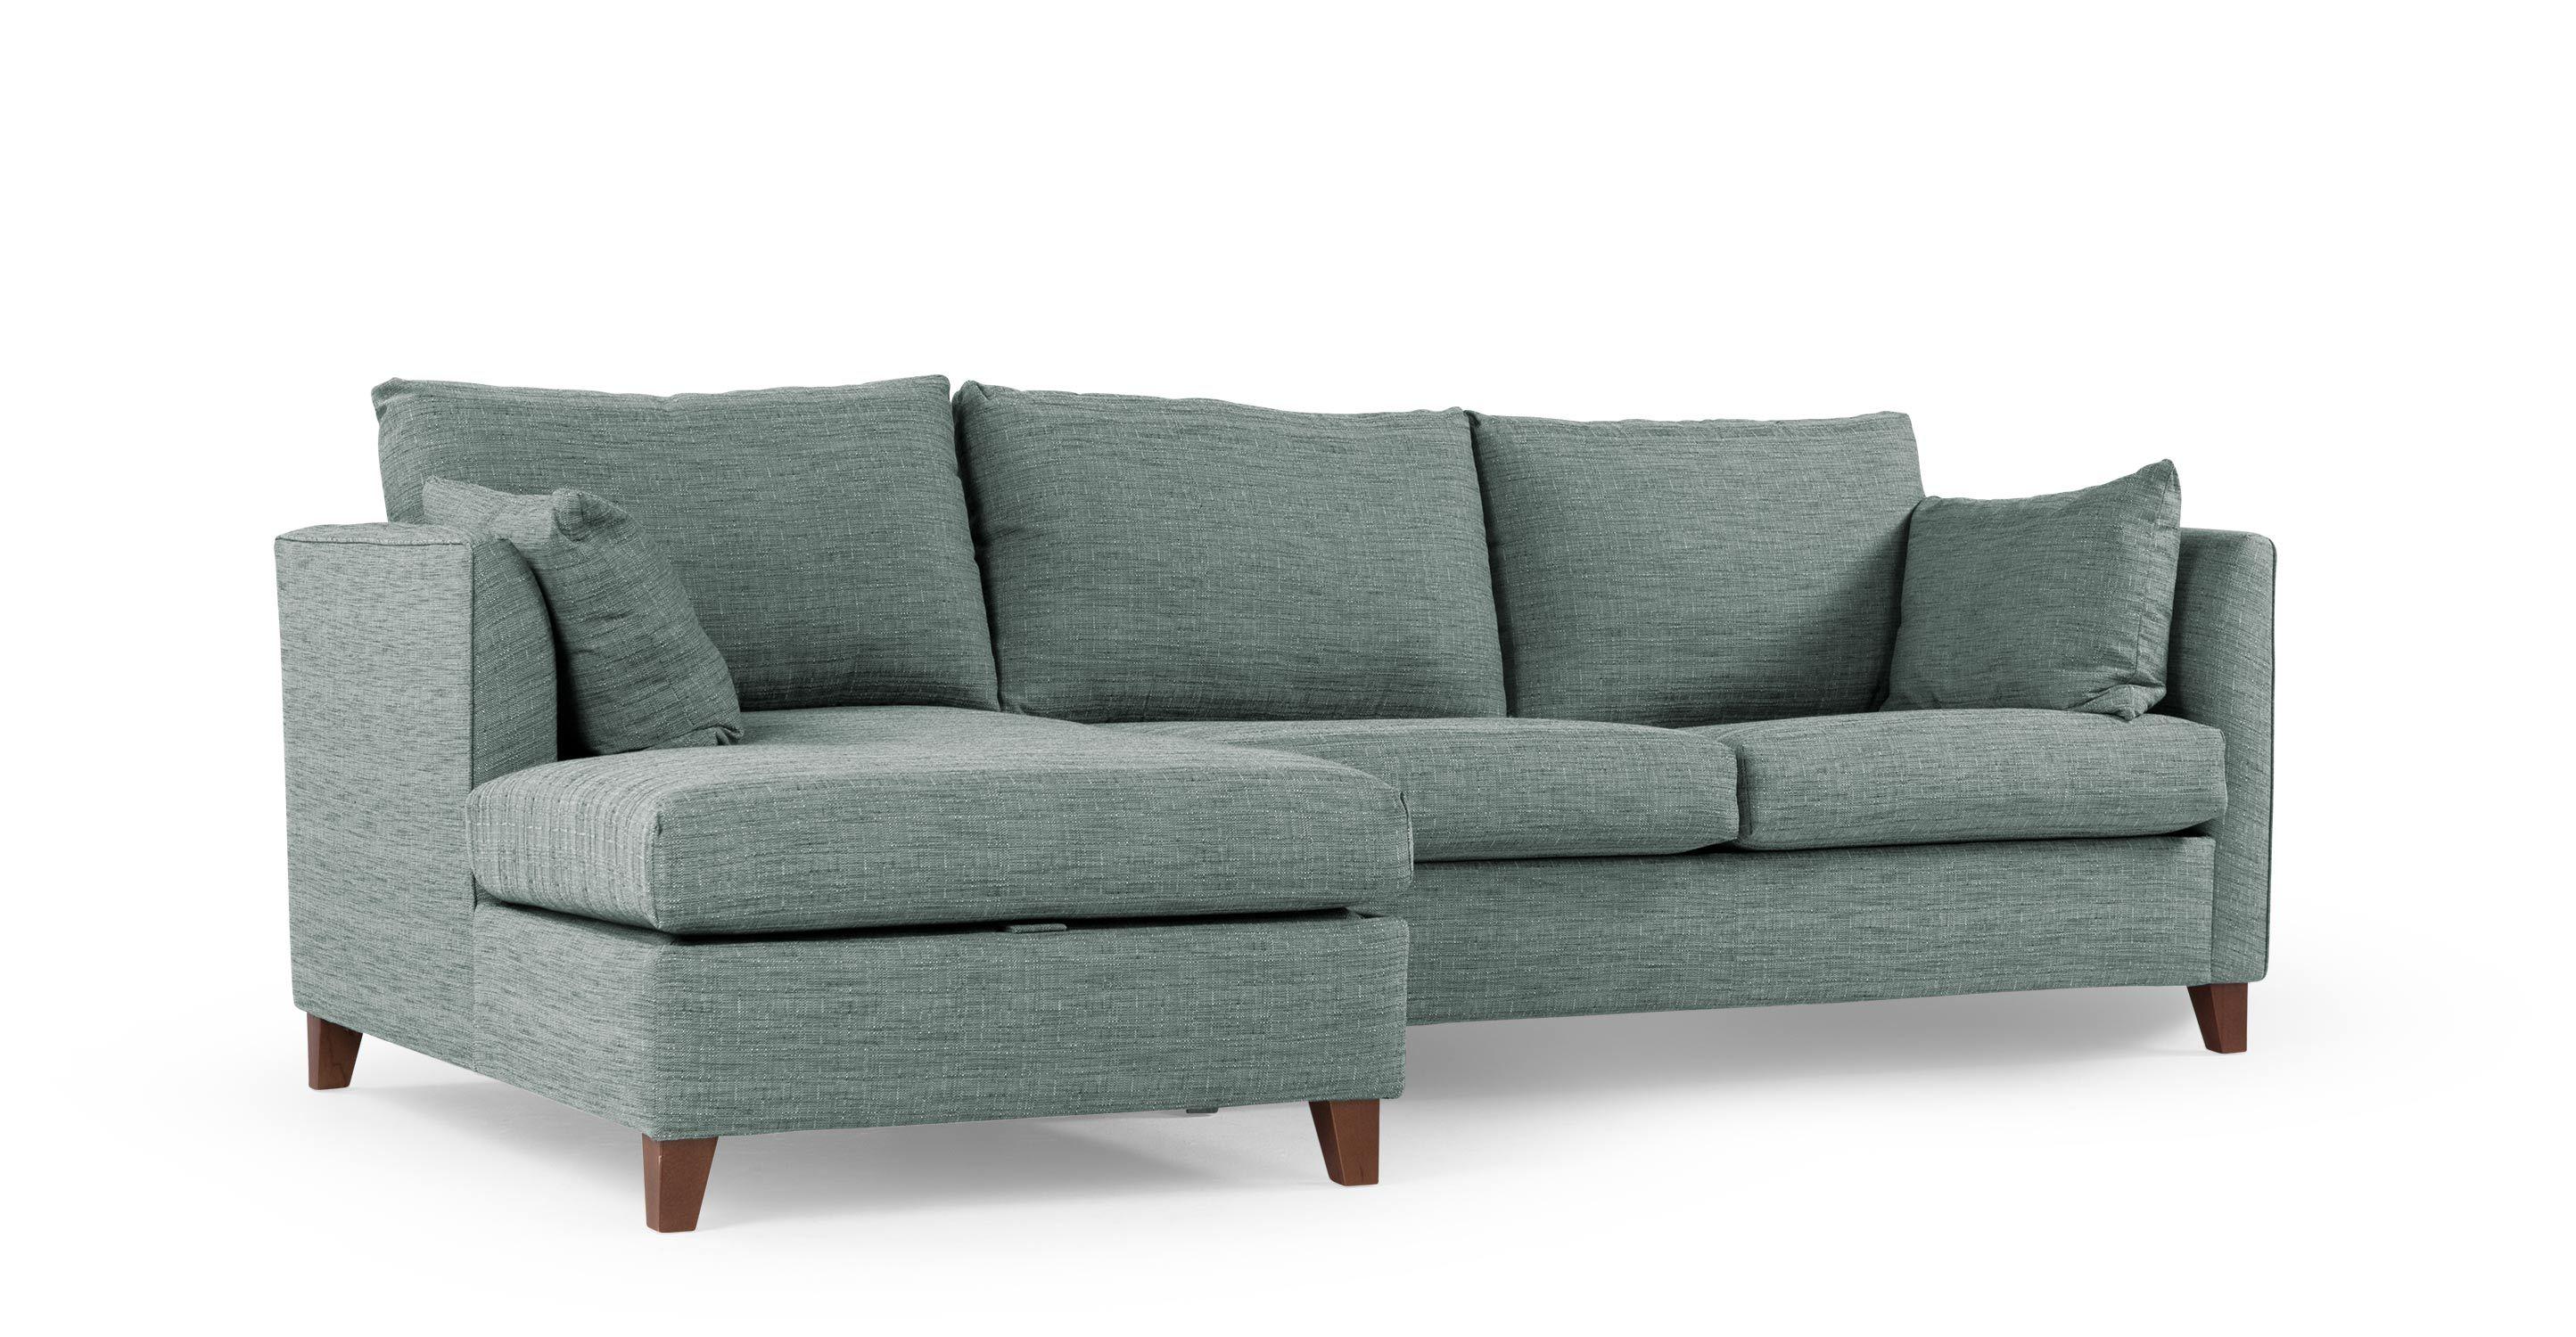 Bari Left Hand Facing Corner Storage Sofa Bed, Malva Denim